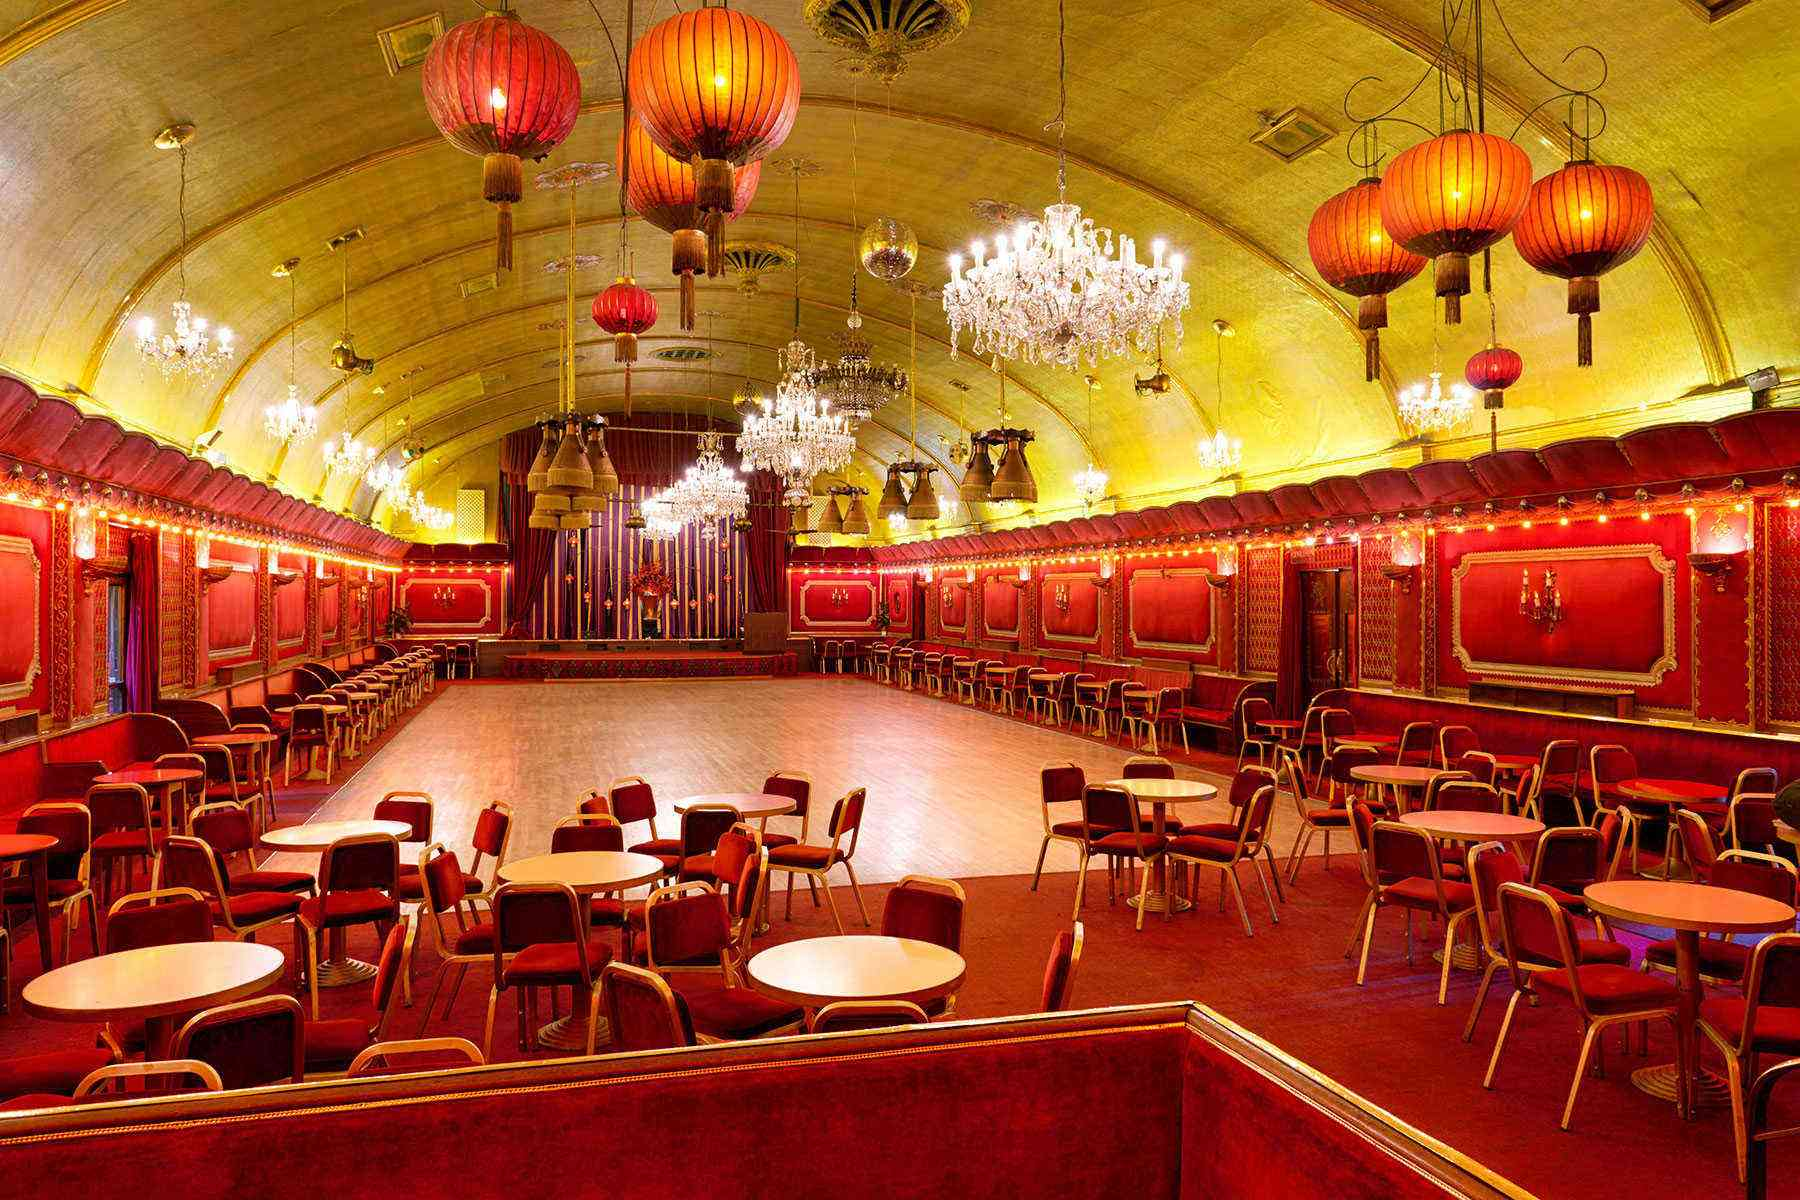 Under-The-Radar-London-Rivoli-Ballroom-1